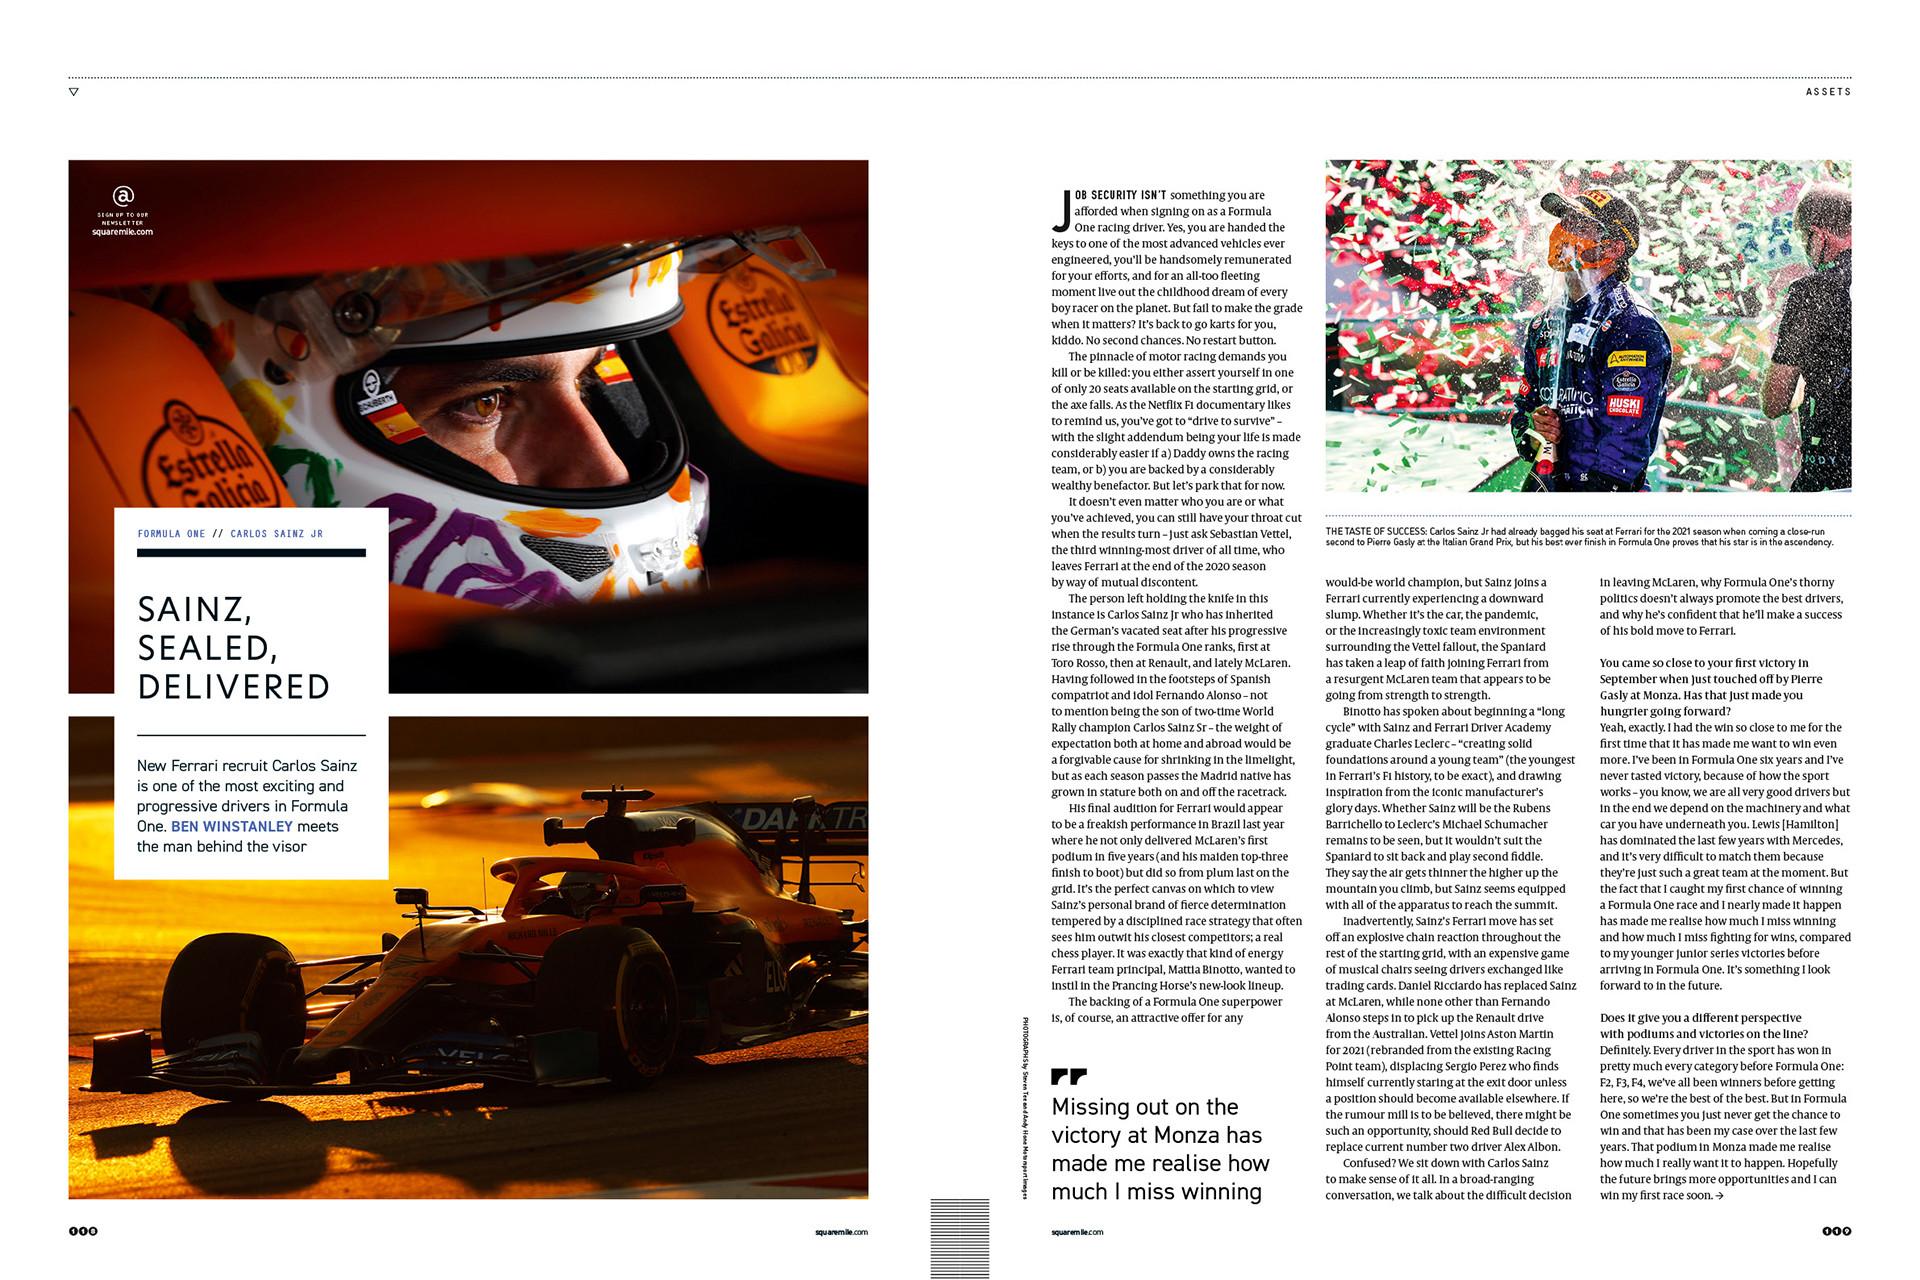 Carlos Sainz for Square Mile magazine